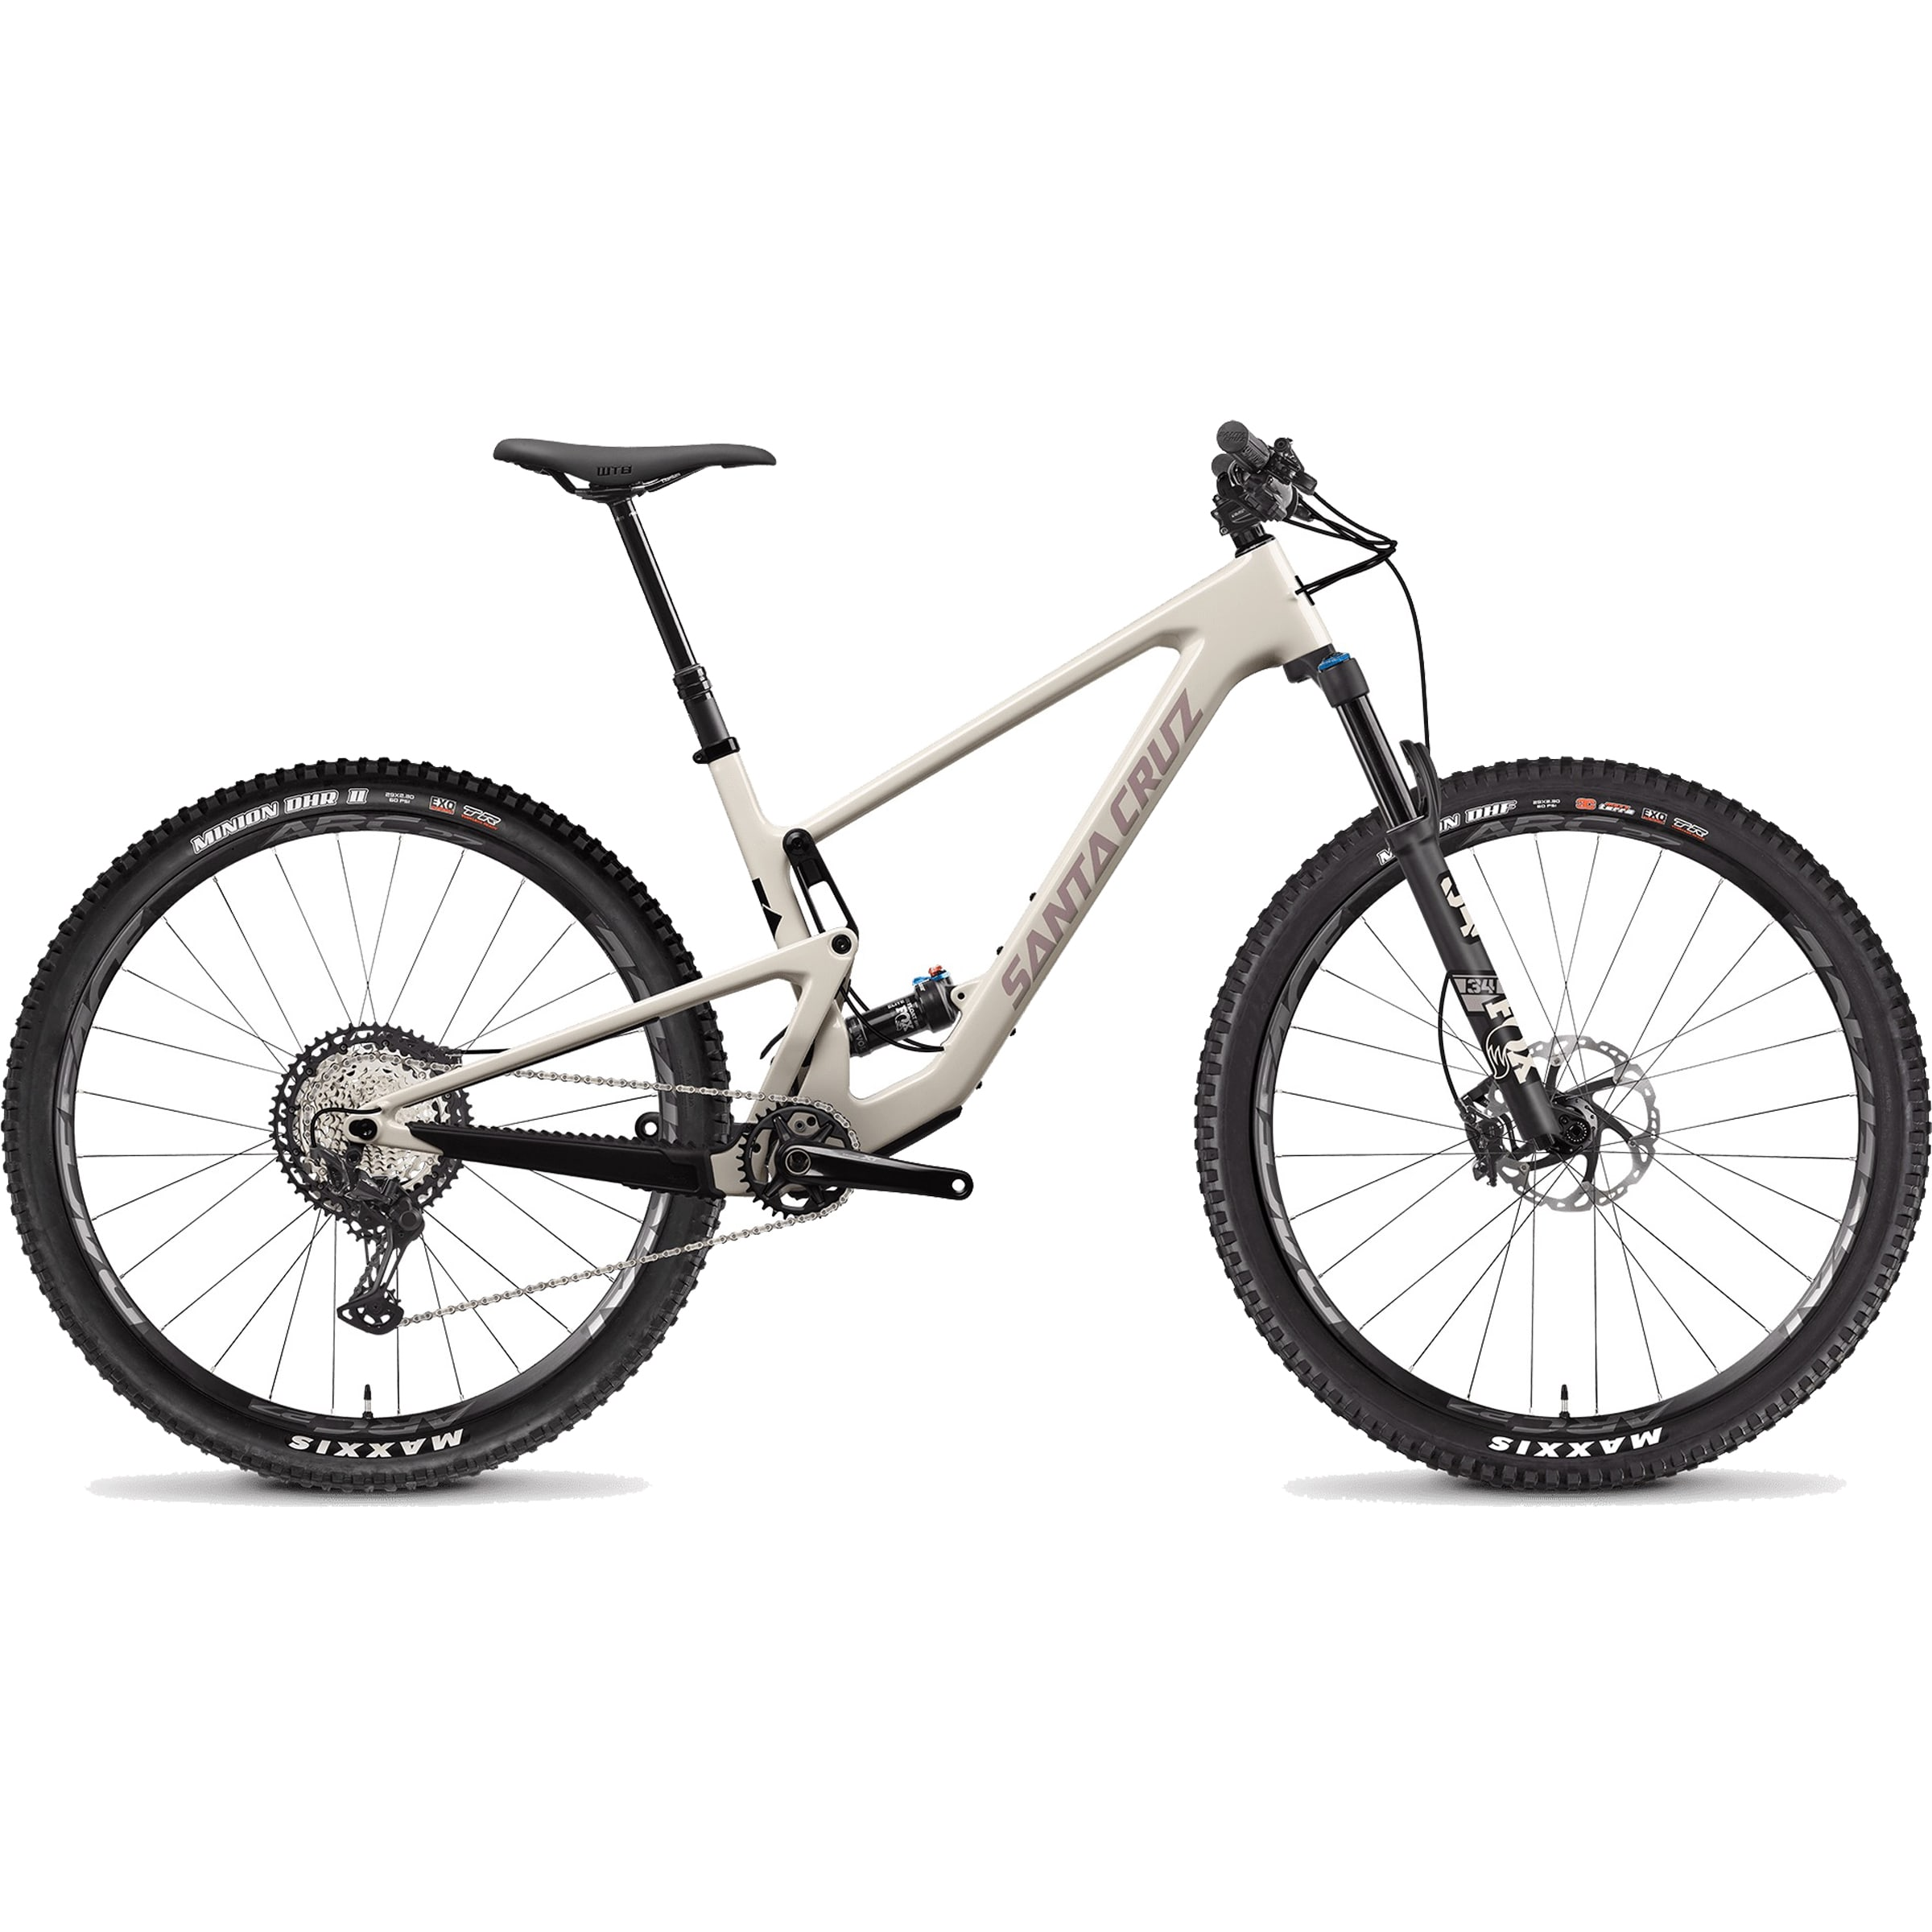 Specialized Crosstrail Hydraulic Disc Hybrid Bike 2019 Black/chameleon